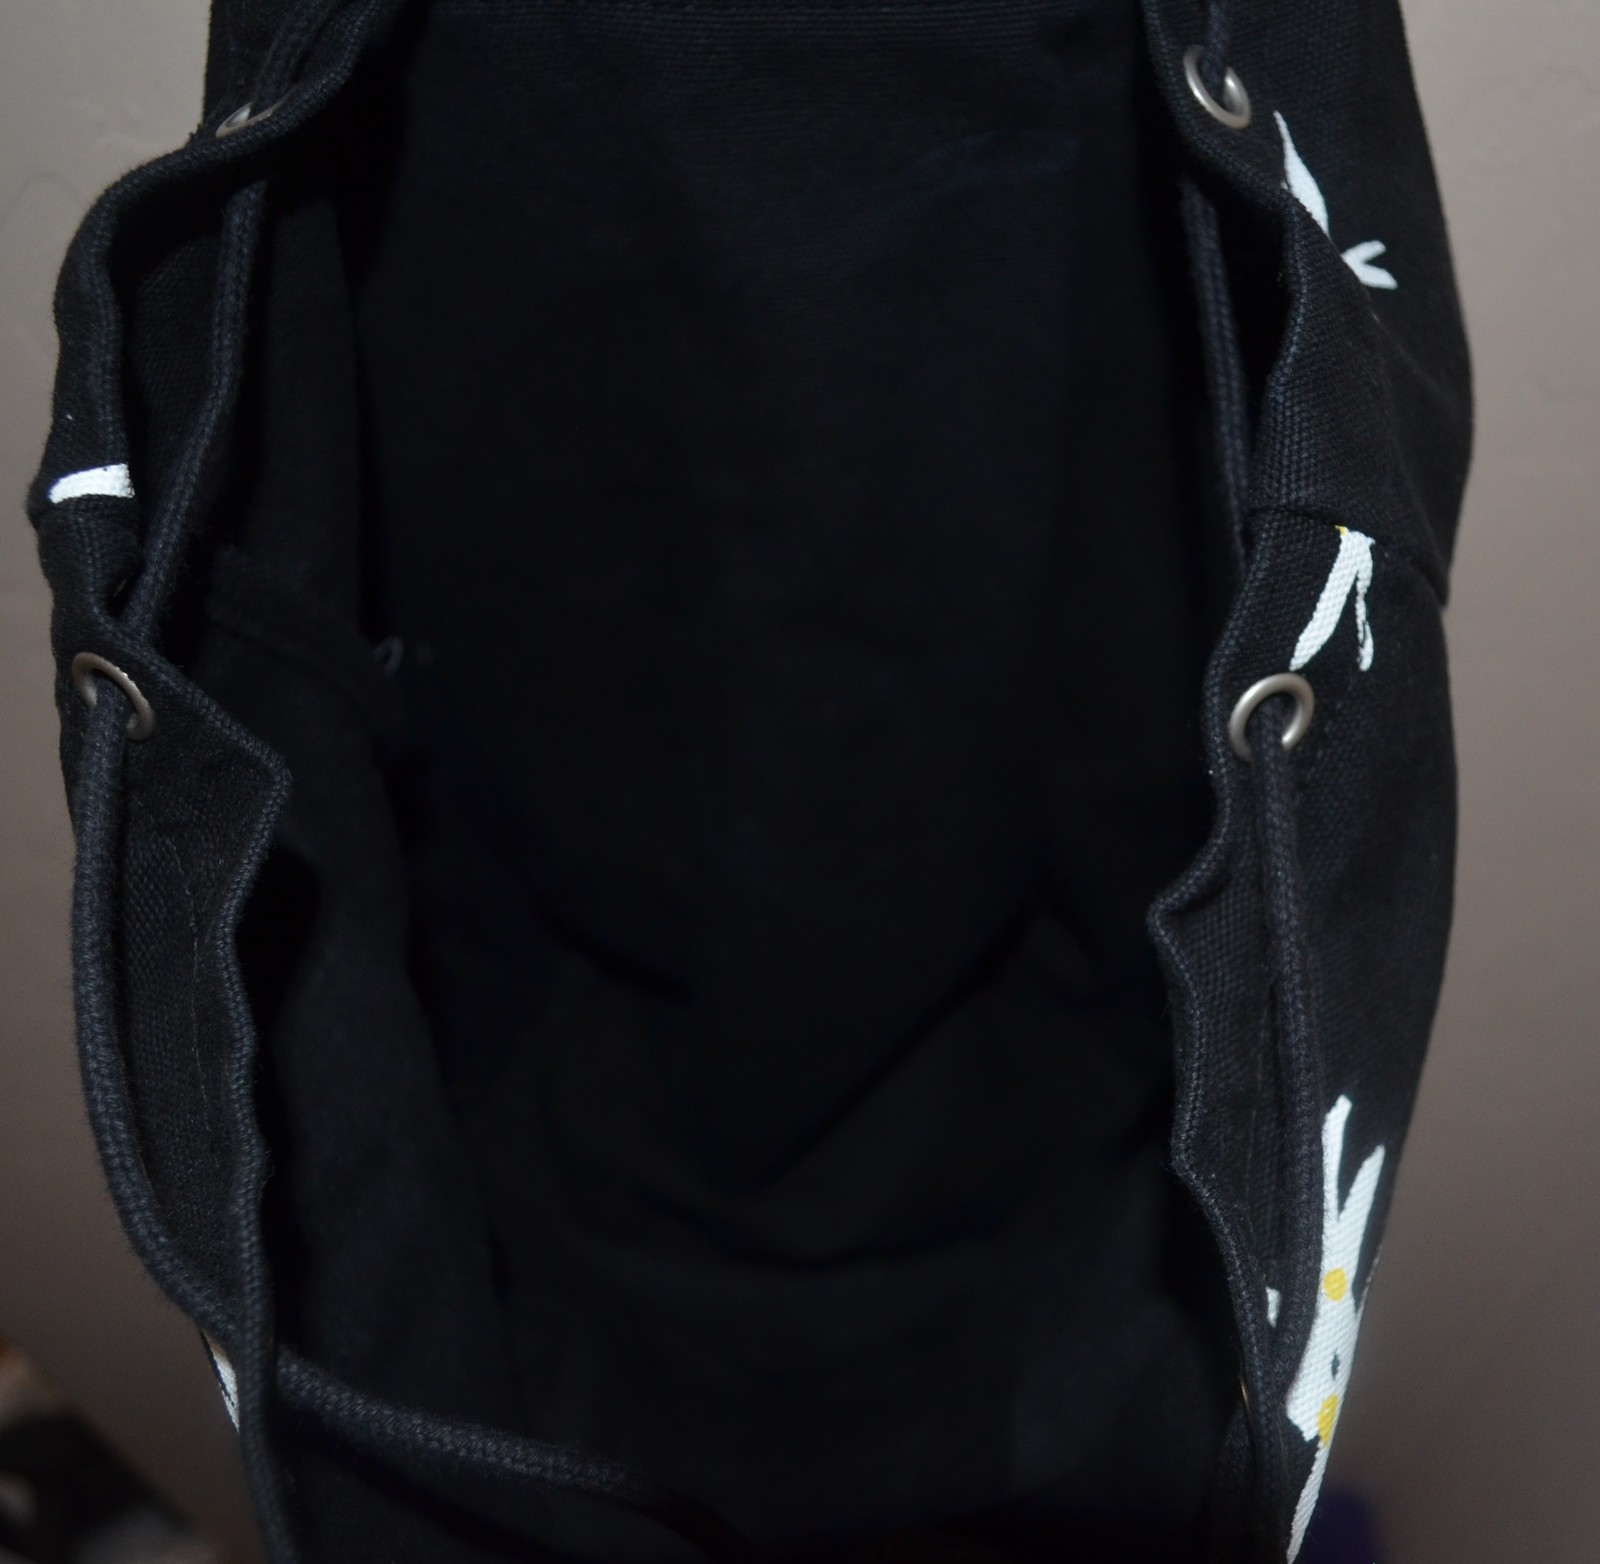 Baggu Recycled Canvas Drawstring Flap Black Floral Sack Backpack  image 8